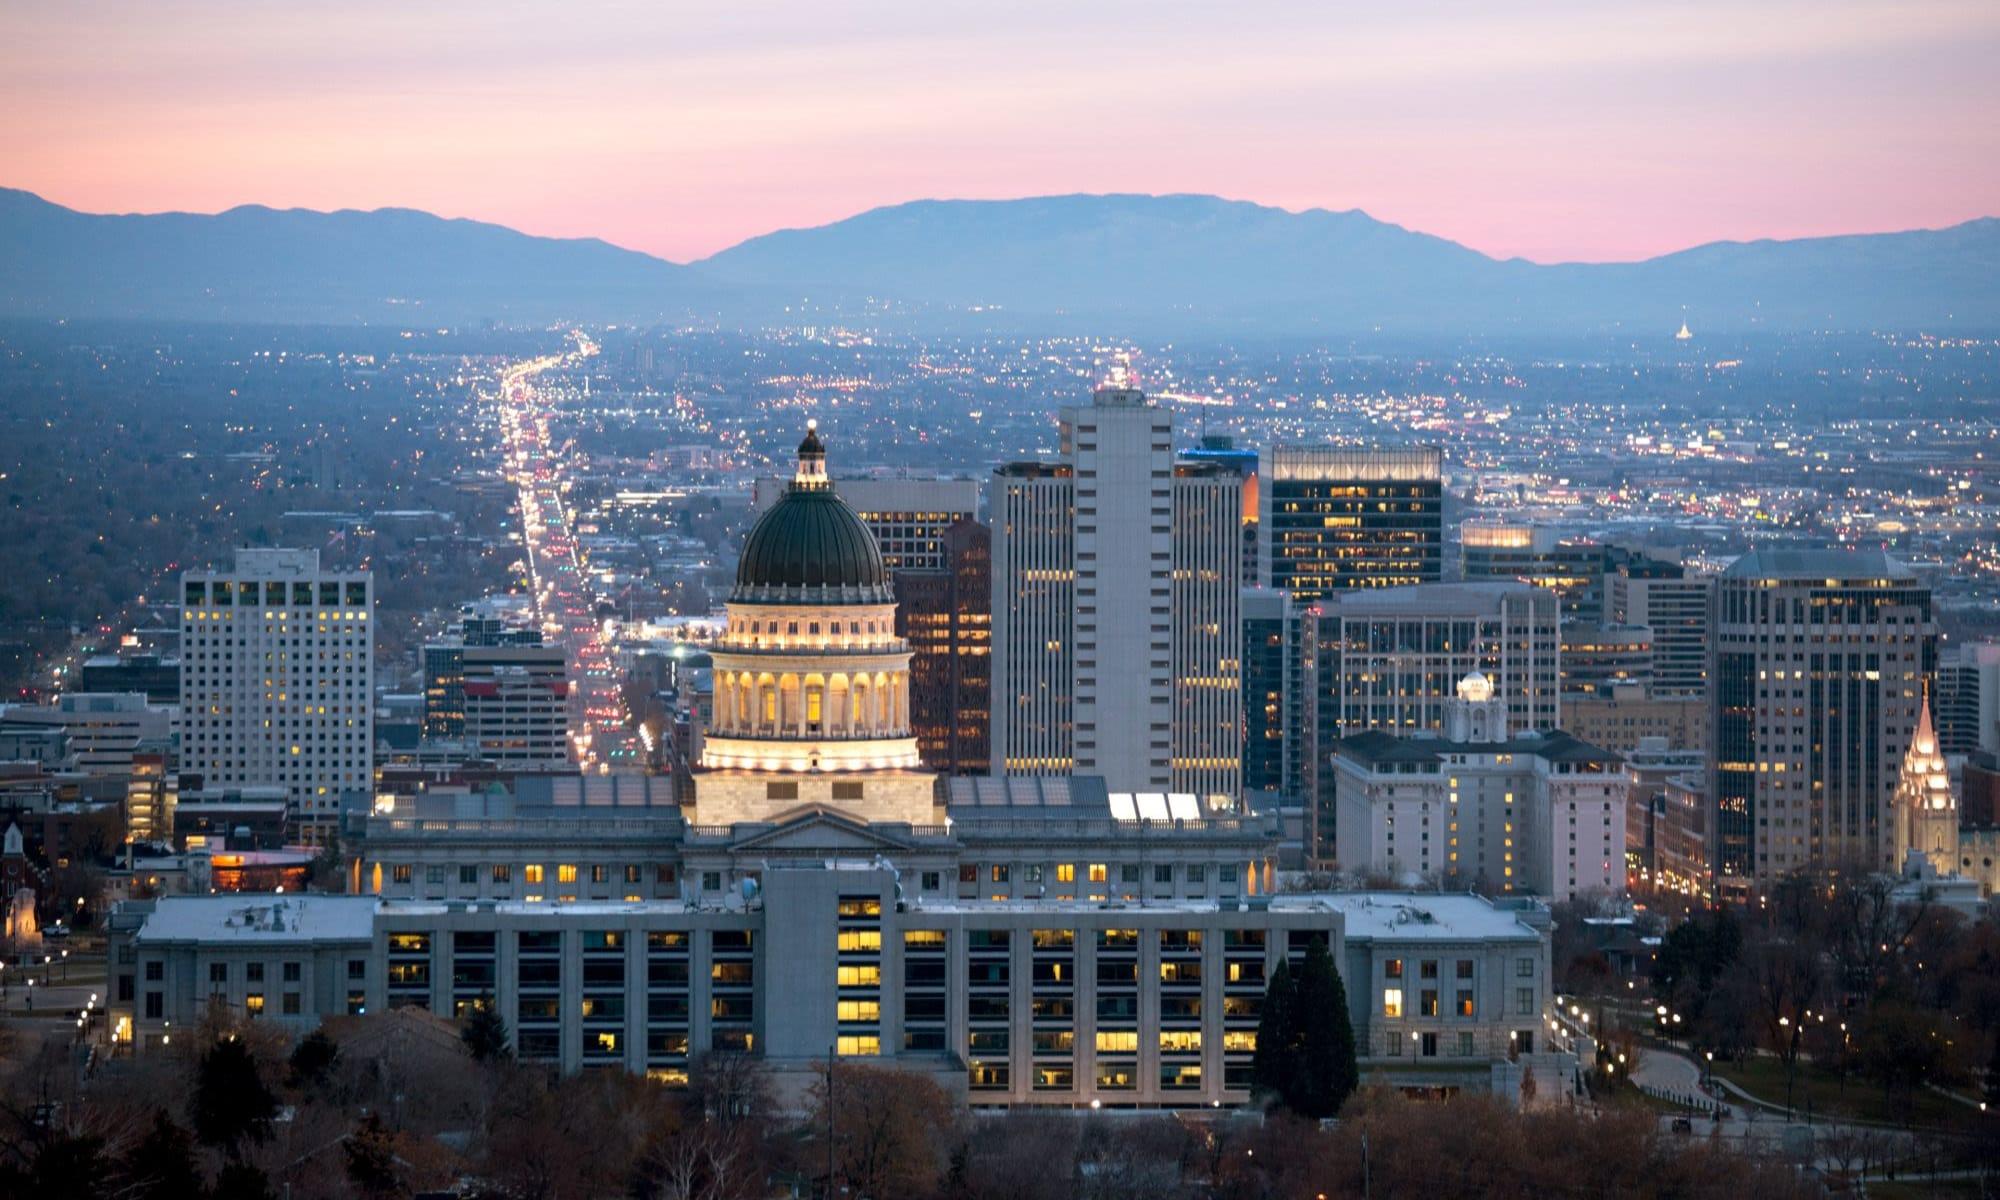 Beautiful view of the city at dusk near Liberty SKY in Salt Lake City, Utah